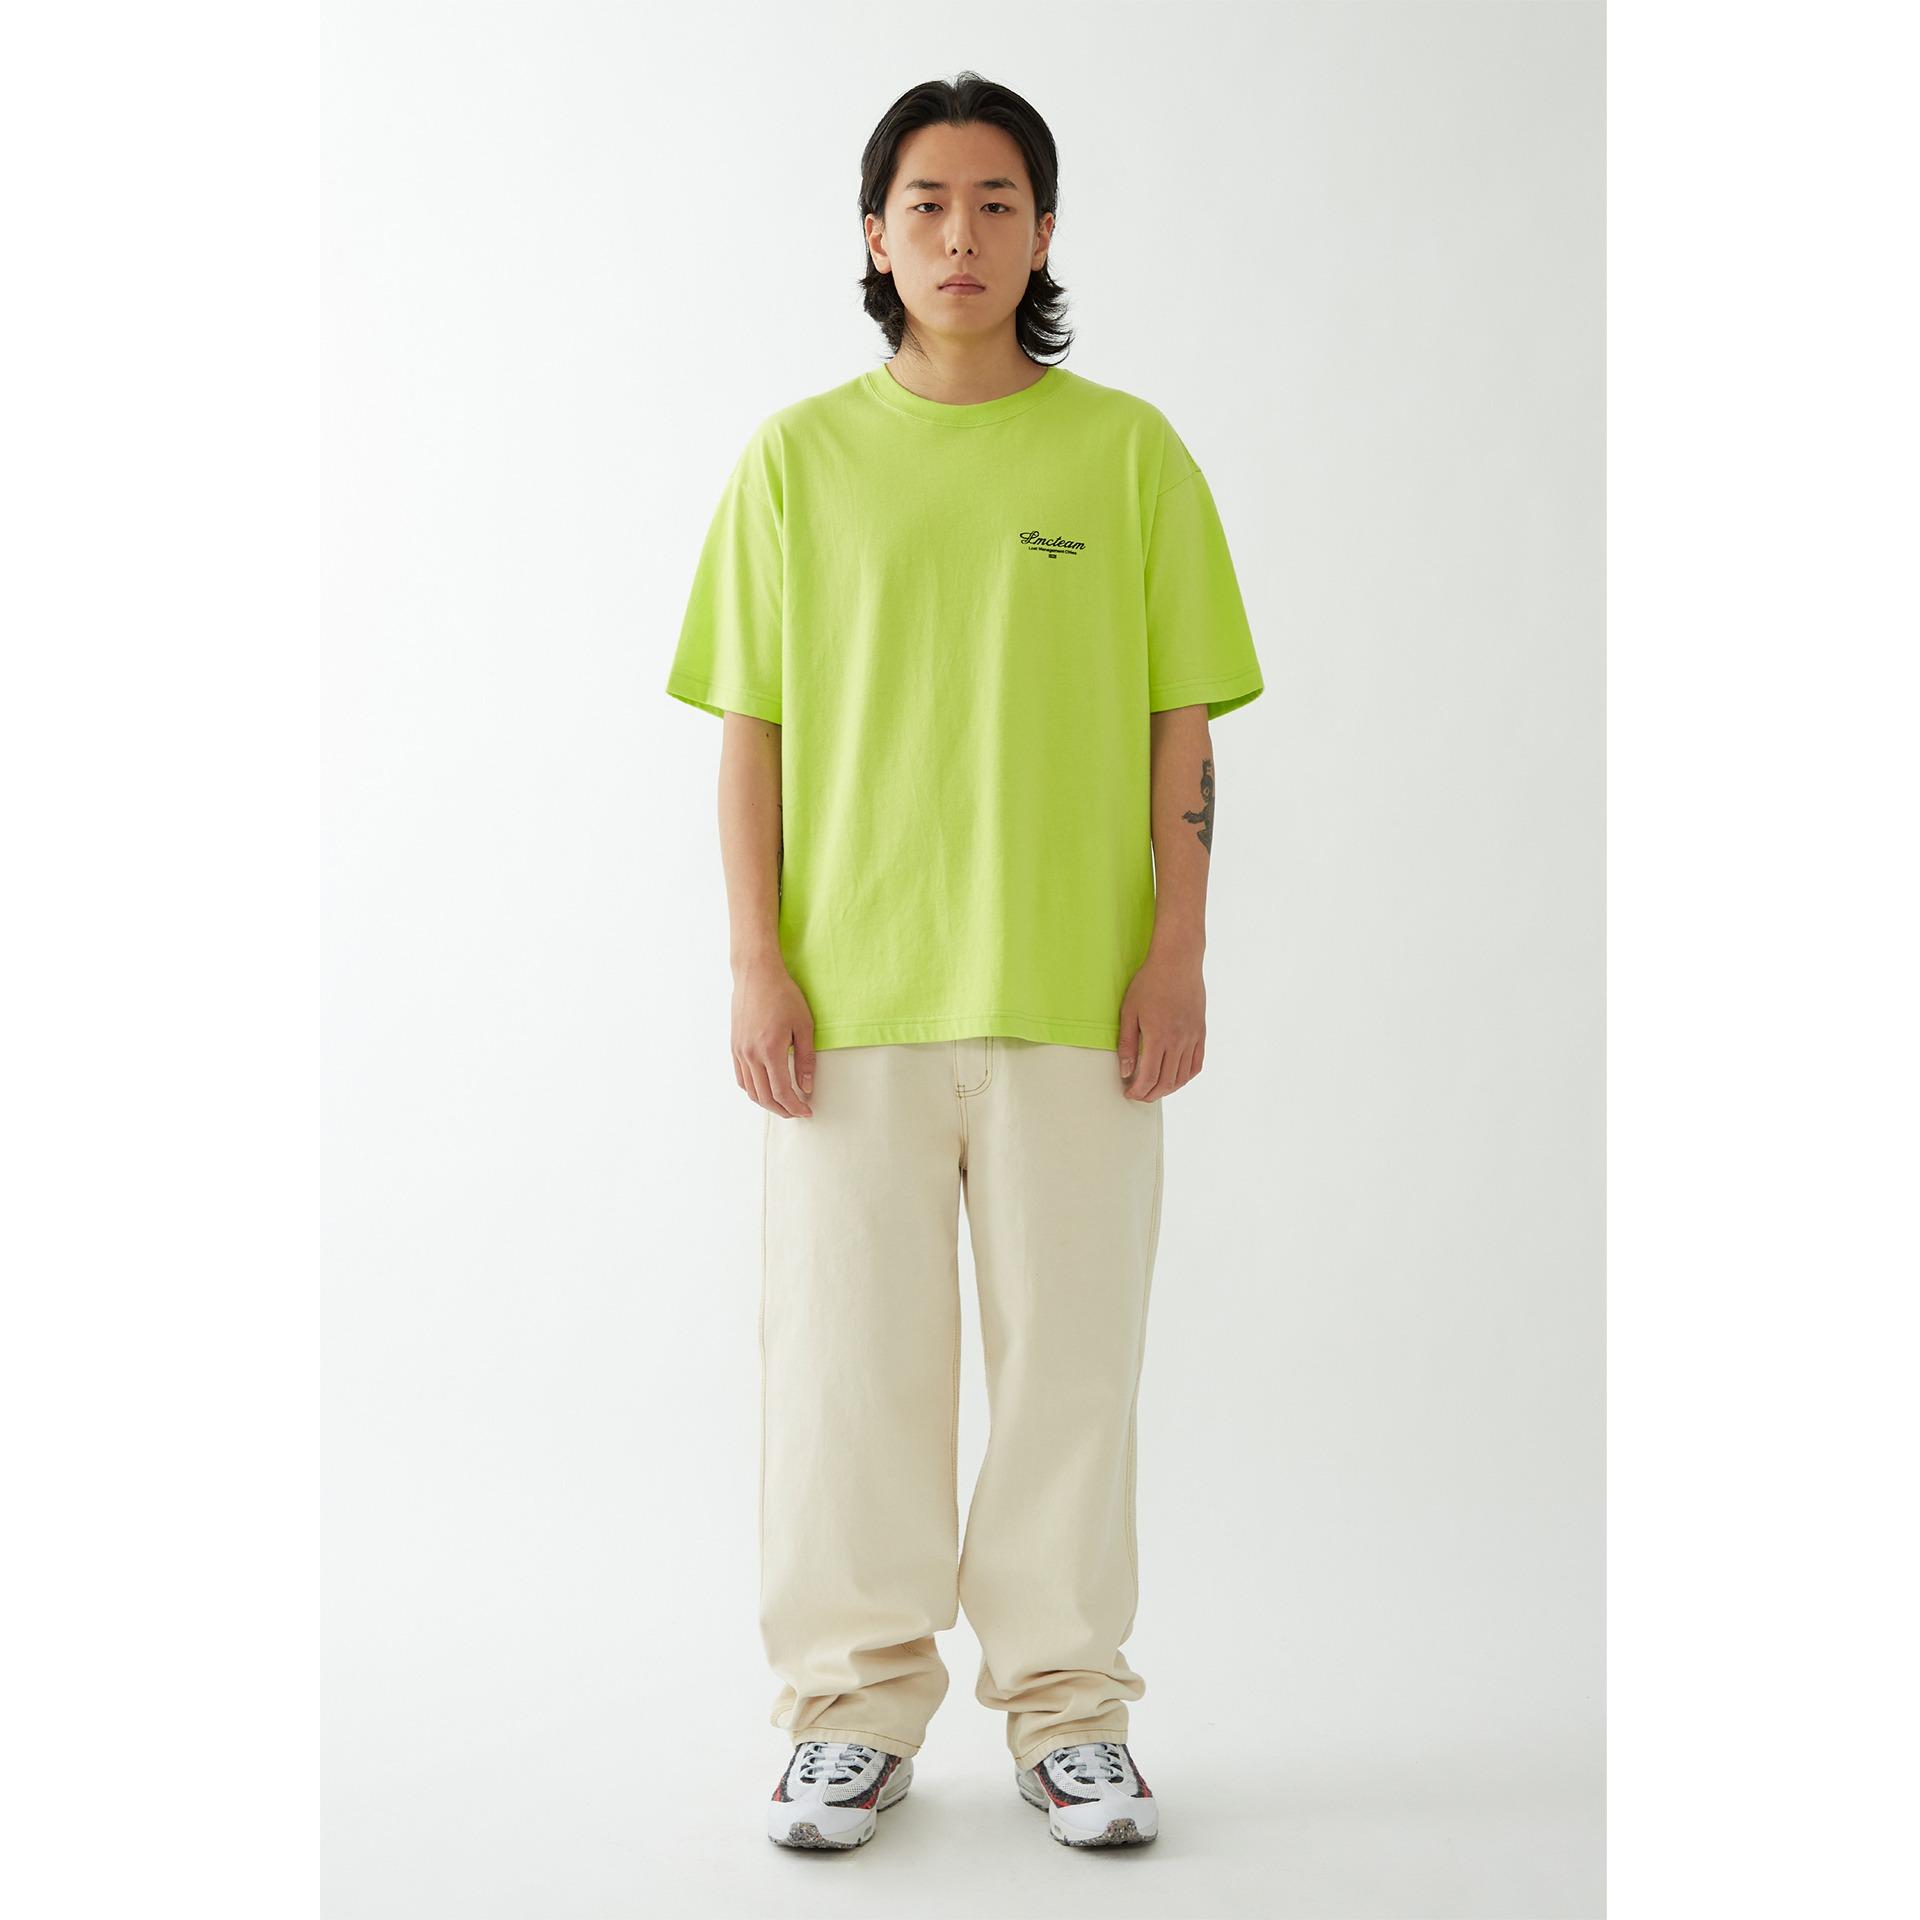 layer-LMC TEAM EARTH ORGANIC TEE light green♡韓國男裝上衣